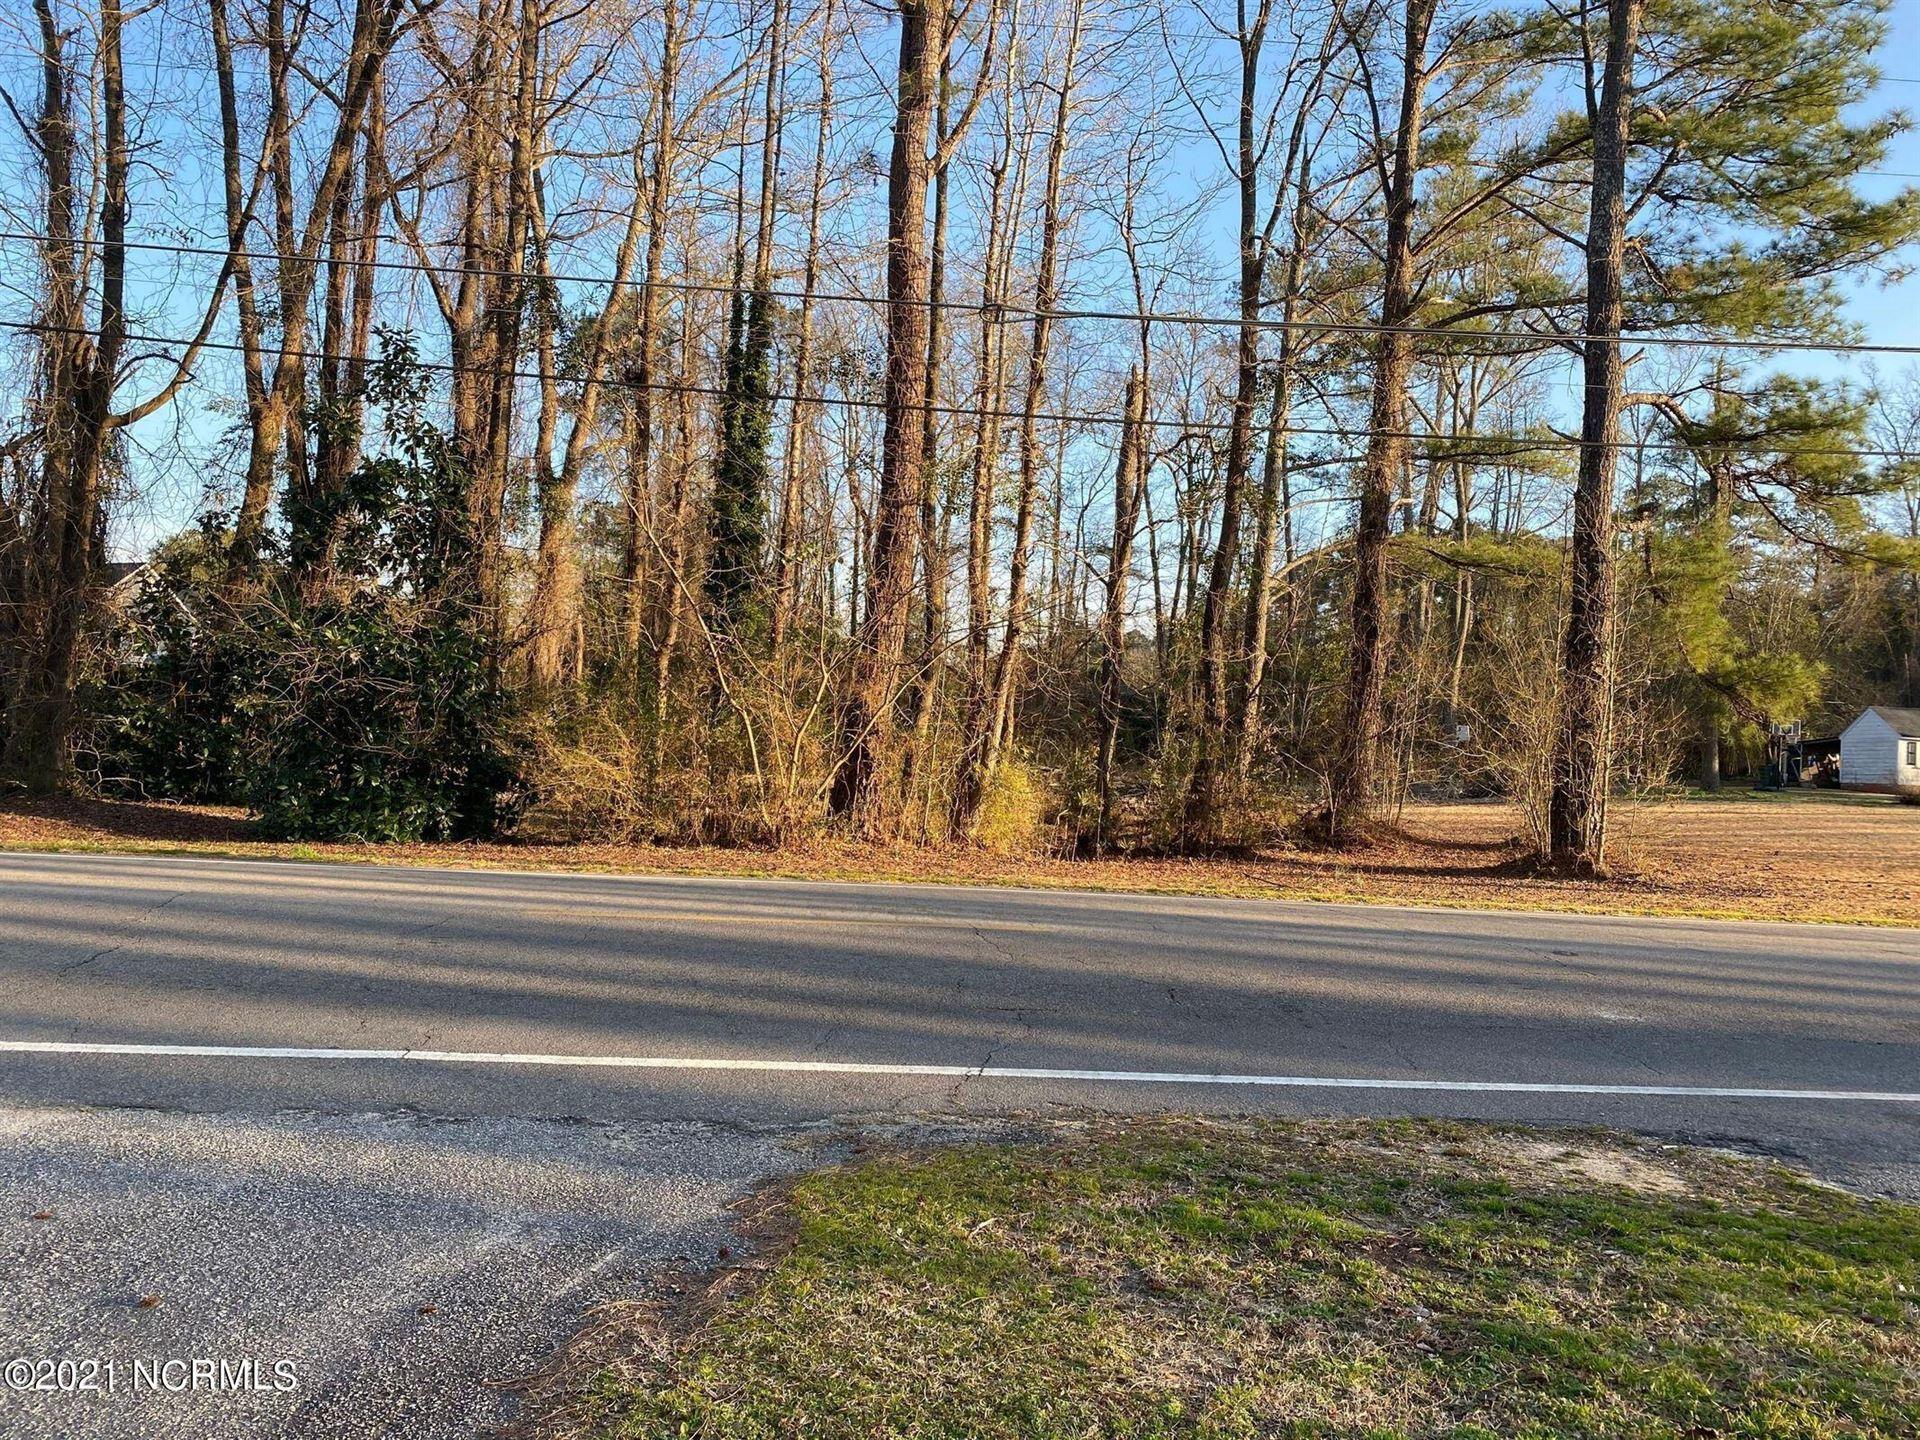 Photo of Tbd Richmond Road, Rockingham, NC 28379 (MLS # 100296602)